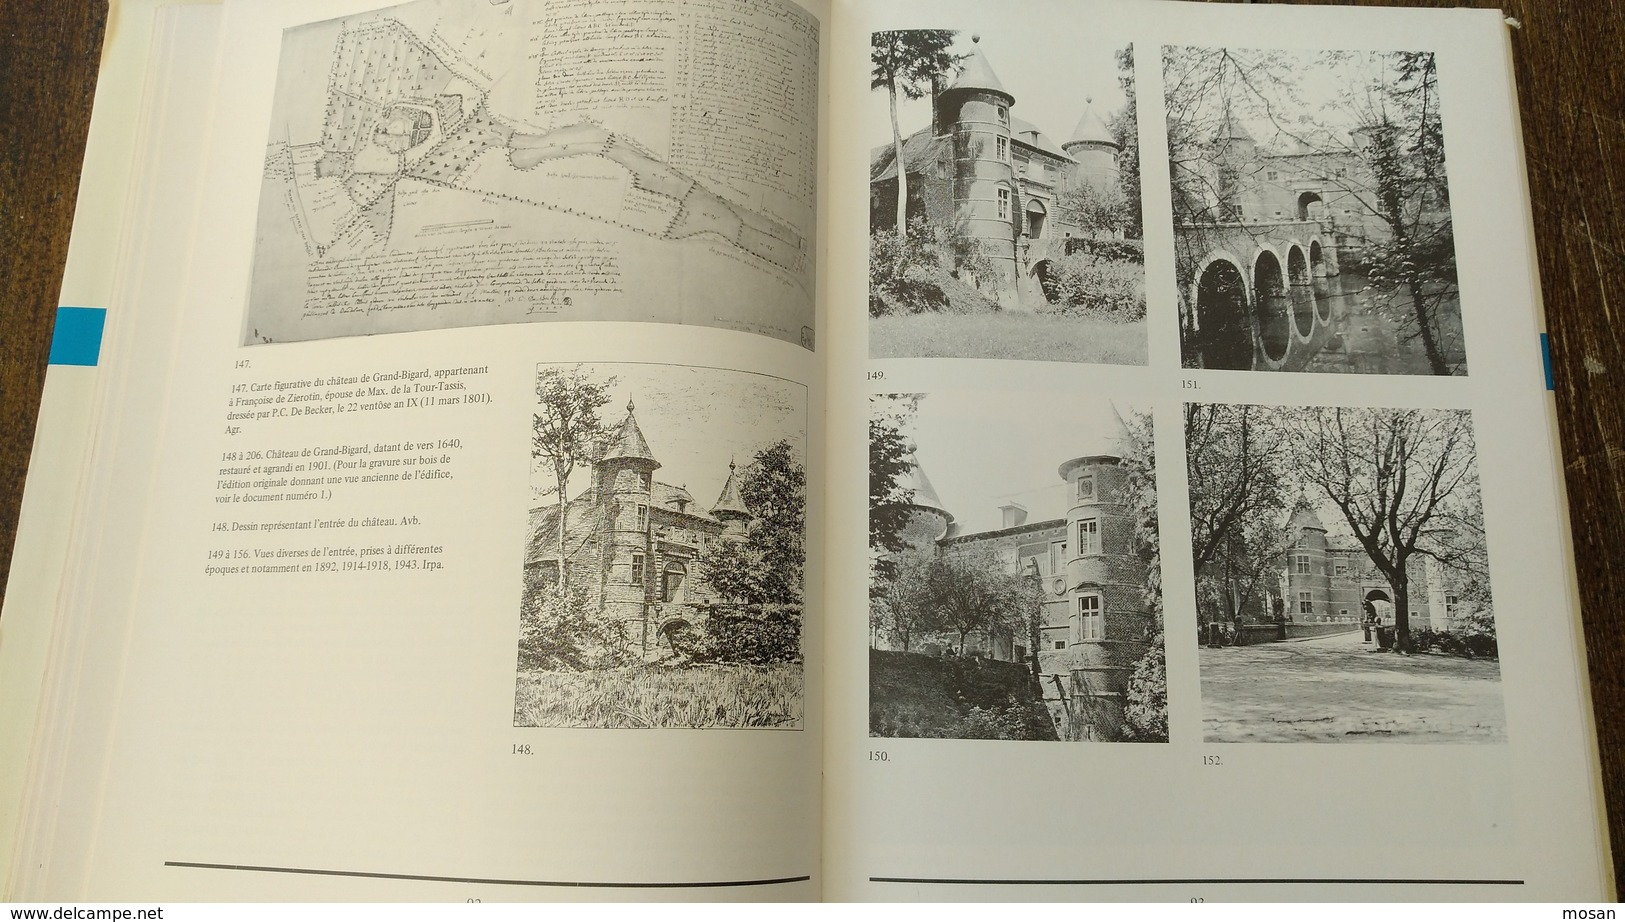 Histoire Des Environs De Bruxelles. Molenbeek, Koekelberg, Berchem-Sainte-Agathe, Grand-Bigard, Zellik, Cobbeghem... - Cultuur